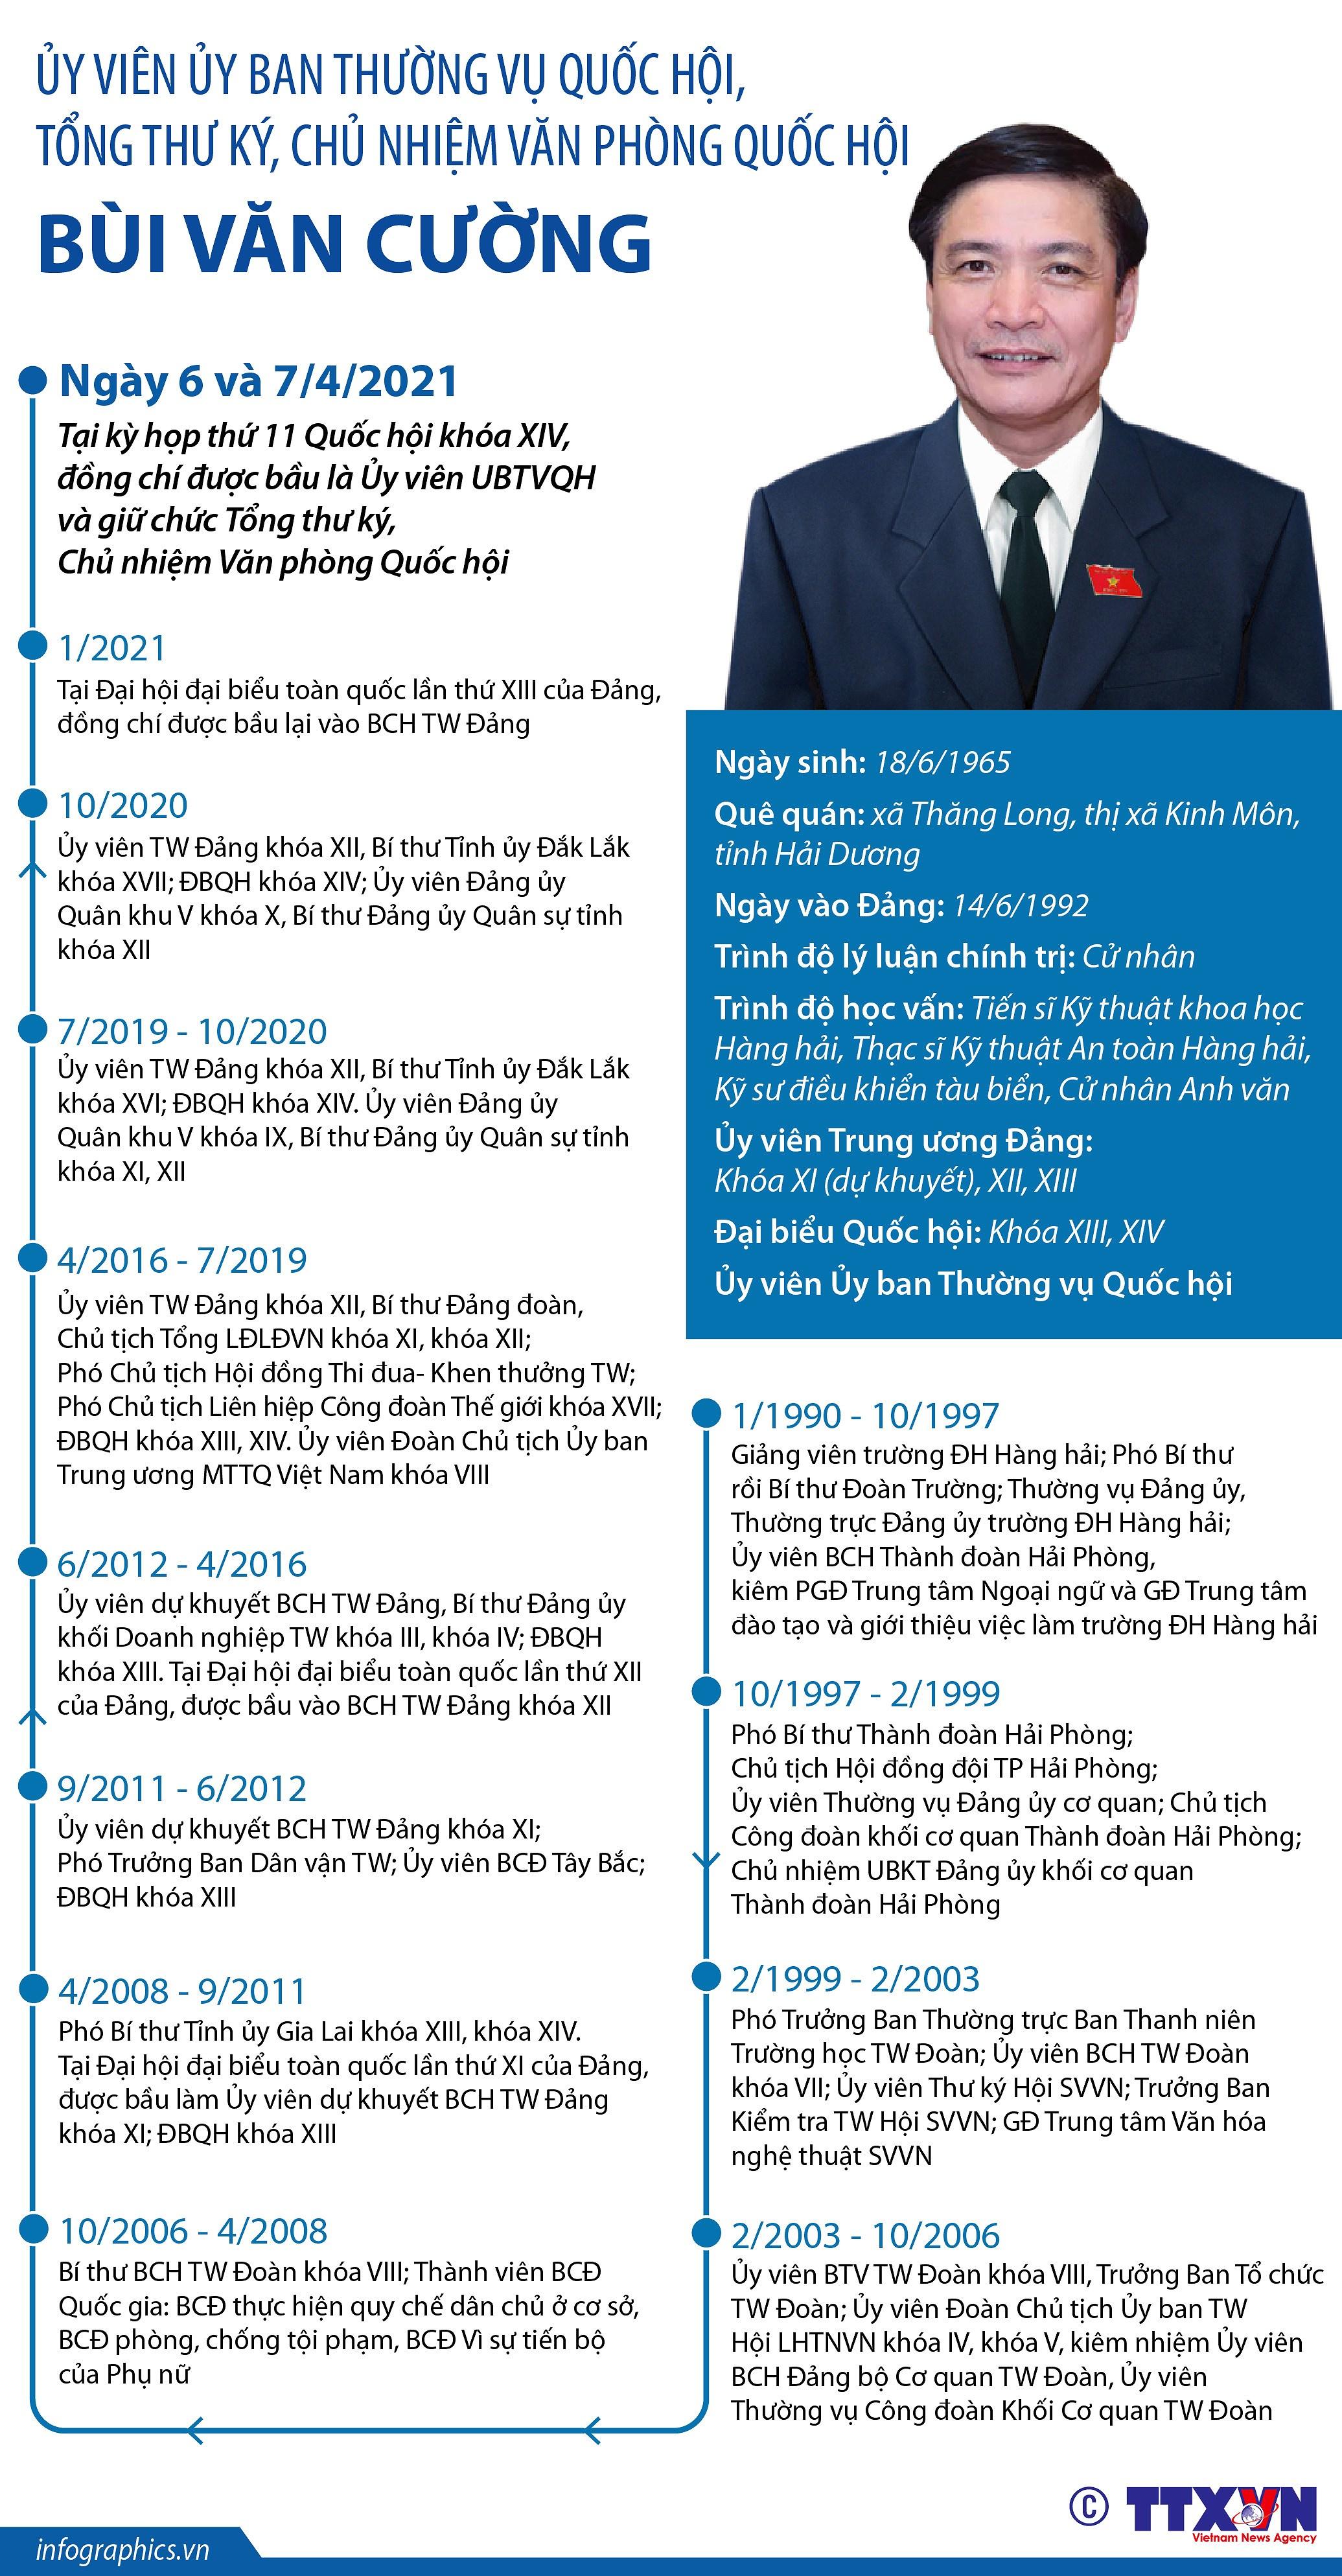 [Infographics] Uy vien UBTV Quoc hoi, Tong thu ky QH Bui Van Cuong hinh anh 1